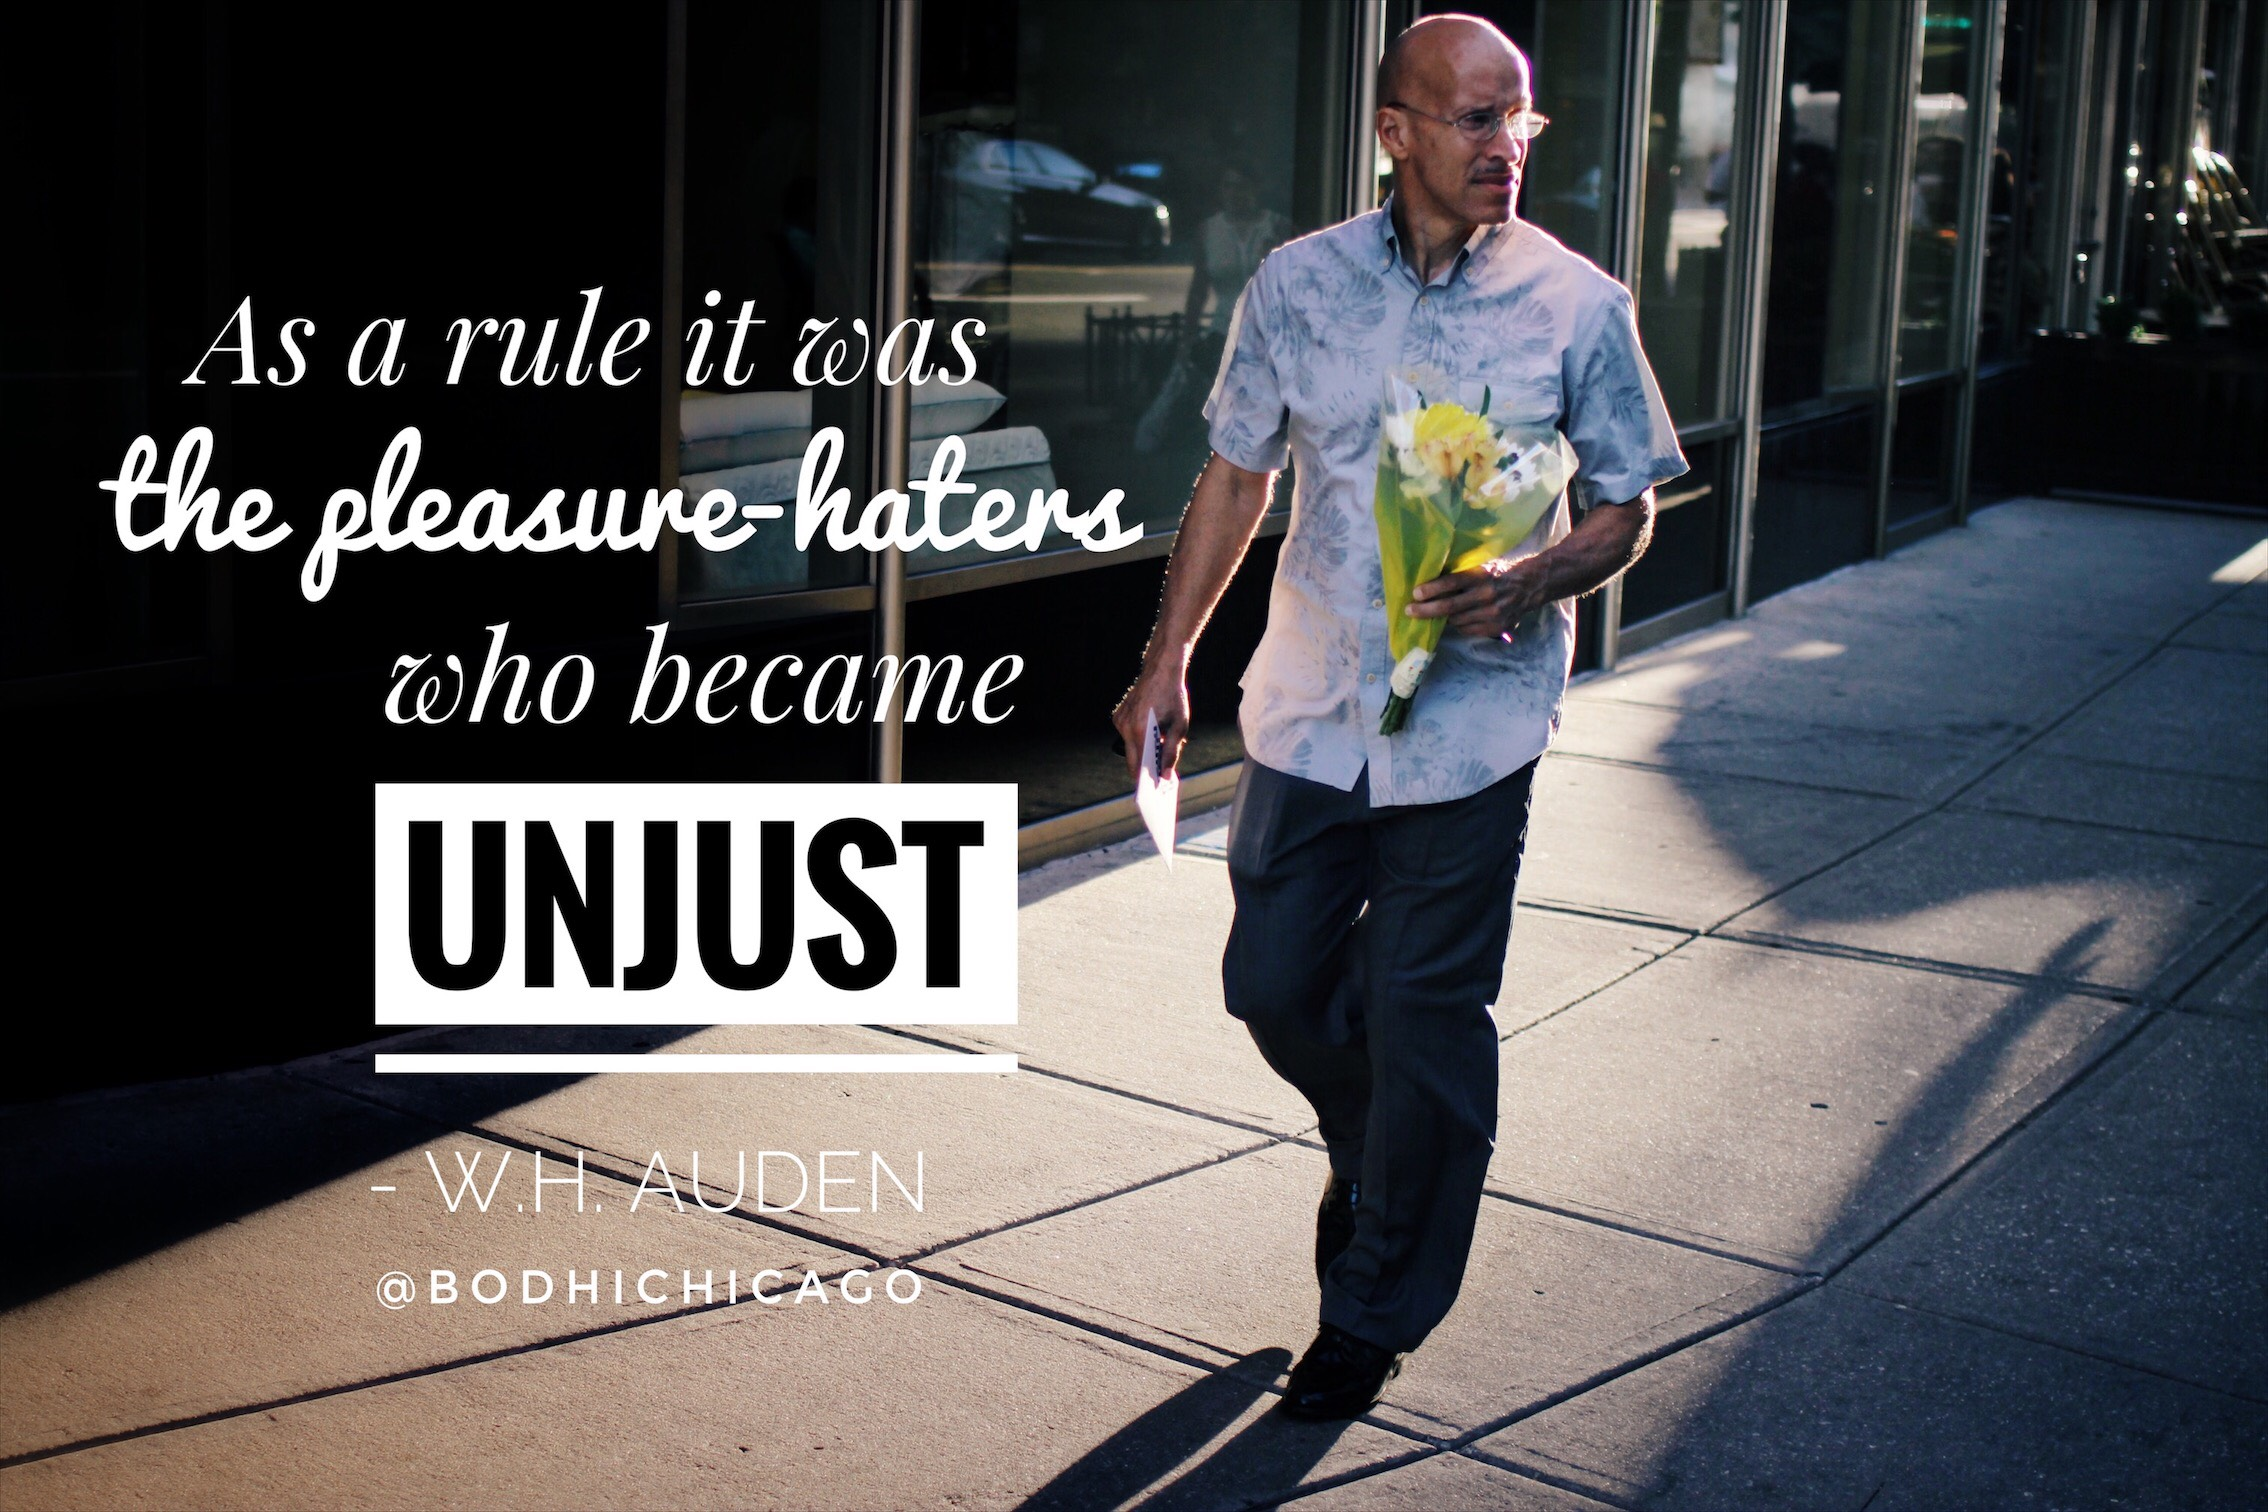 wh auden quote pleasure haters unjust - bodhi spiritual center - wednesday wisdom - 02.01.17